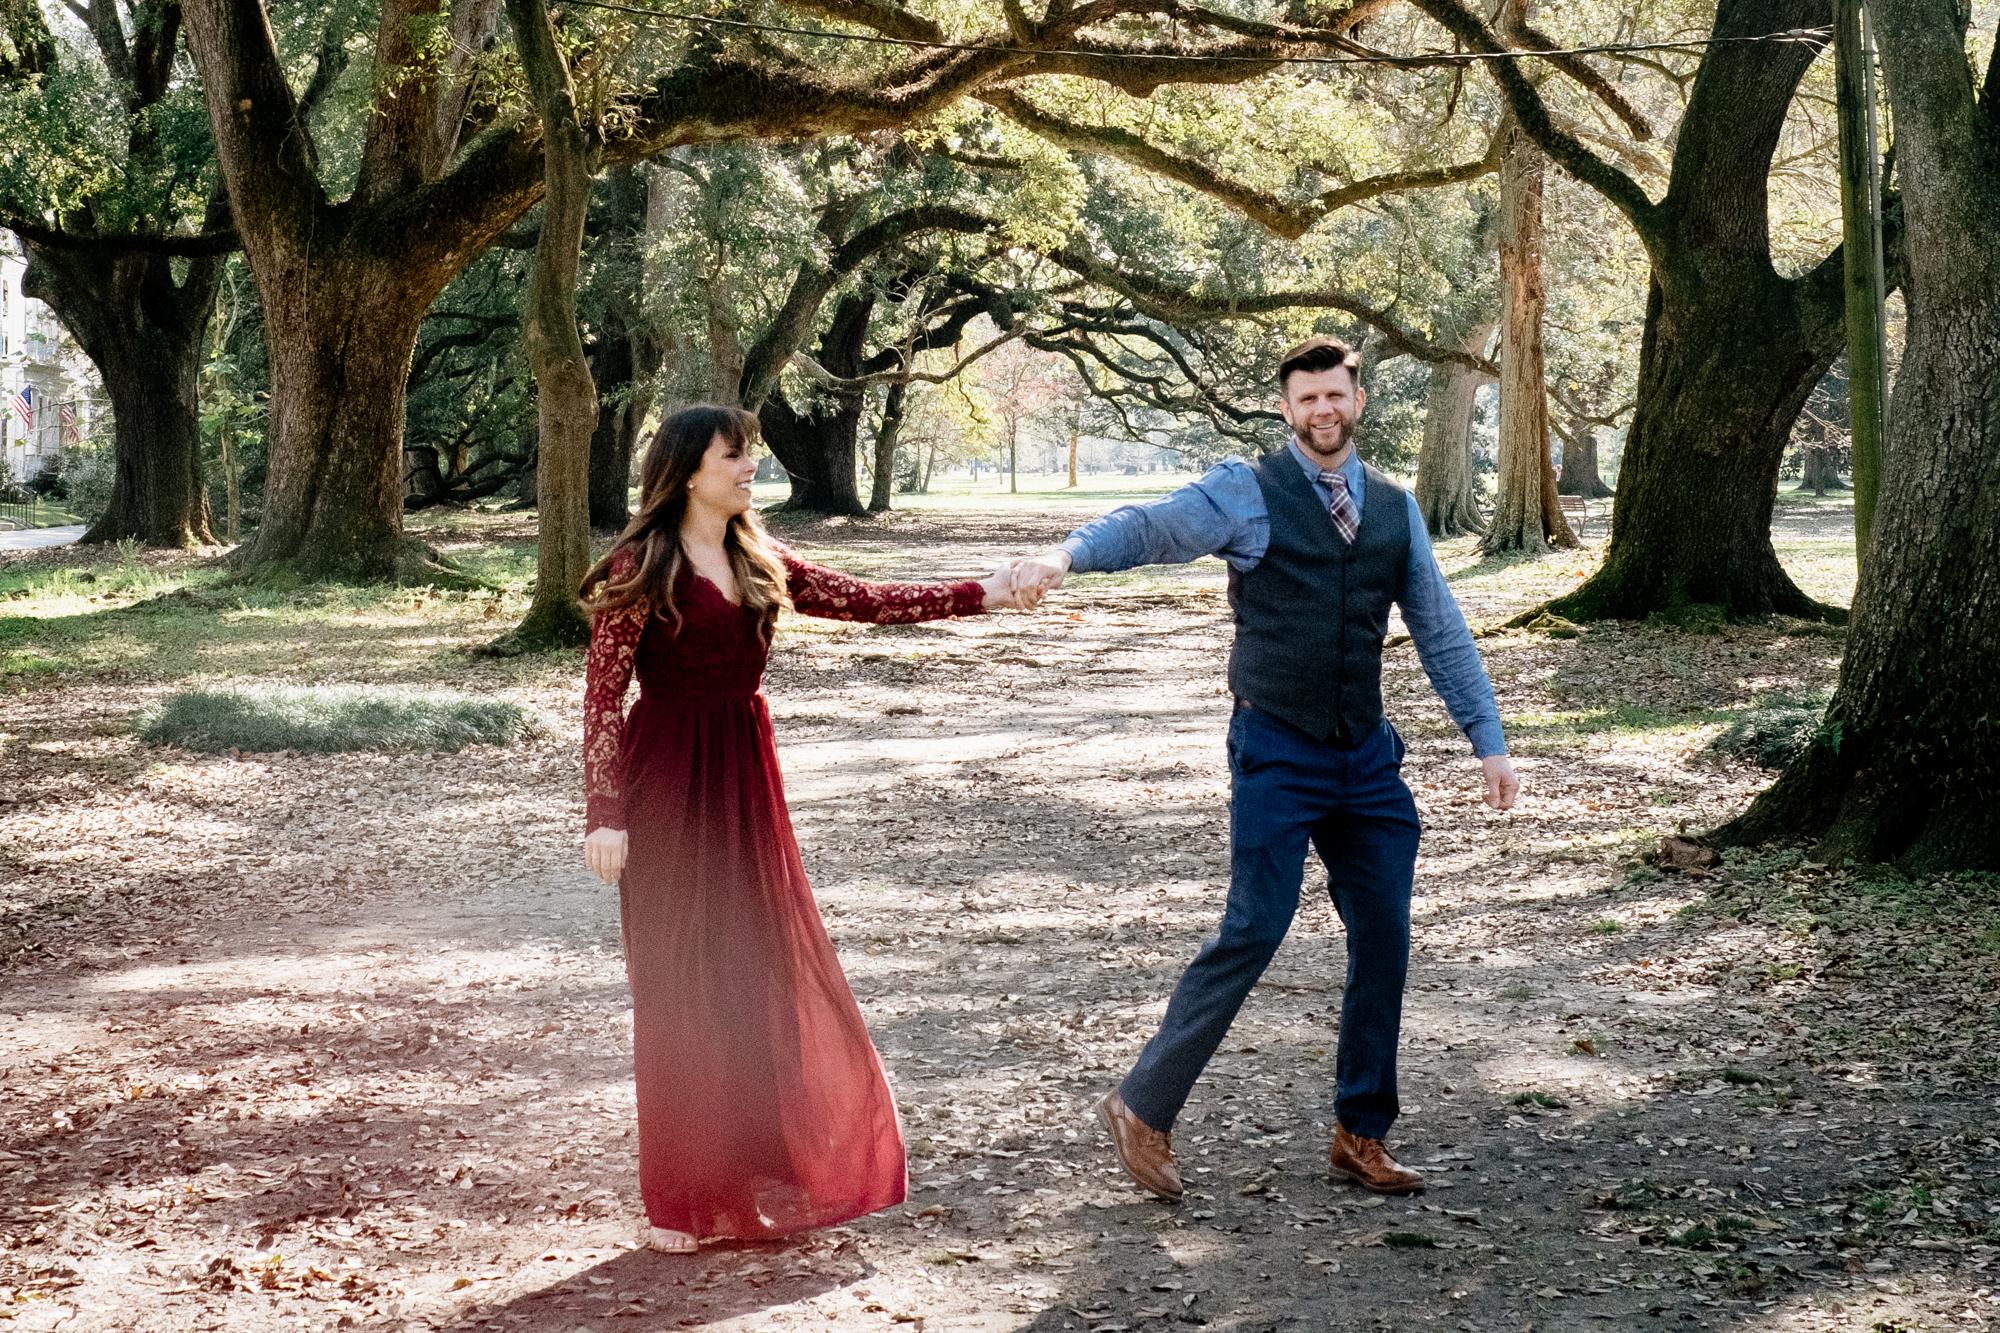 Jen_Montgomery_Photography_Angela_Brian_Engagement_Proposal_FB-193.jpg